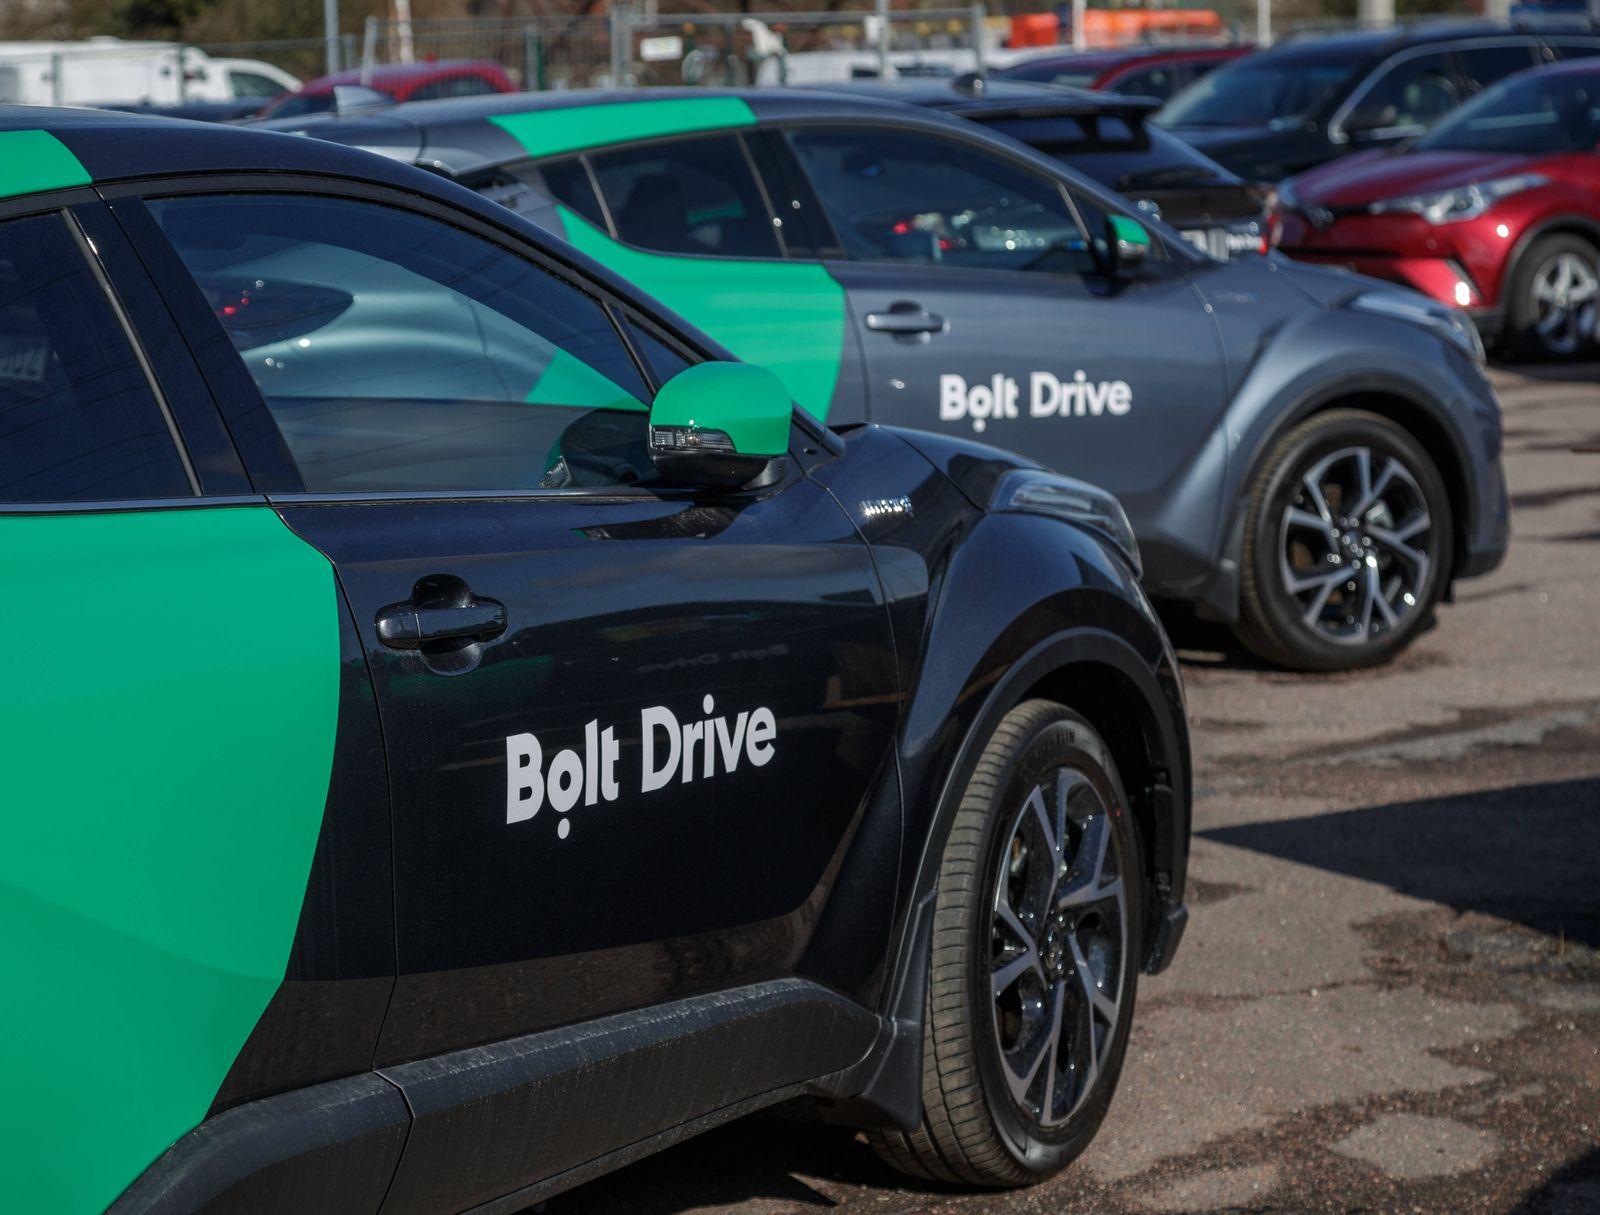 28.04.2021, Tallinn Bolt Drive branded new Toyotas at the parking lot of Amserv car dealer. Bolt will trial rental cars